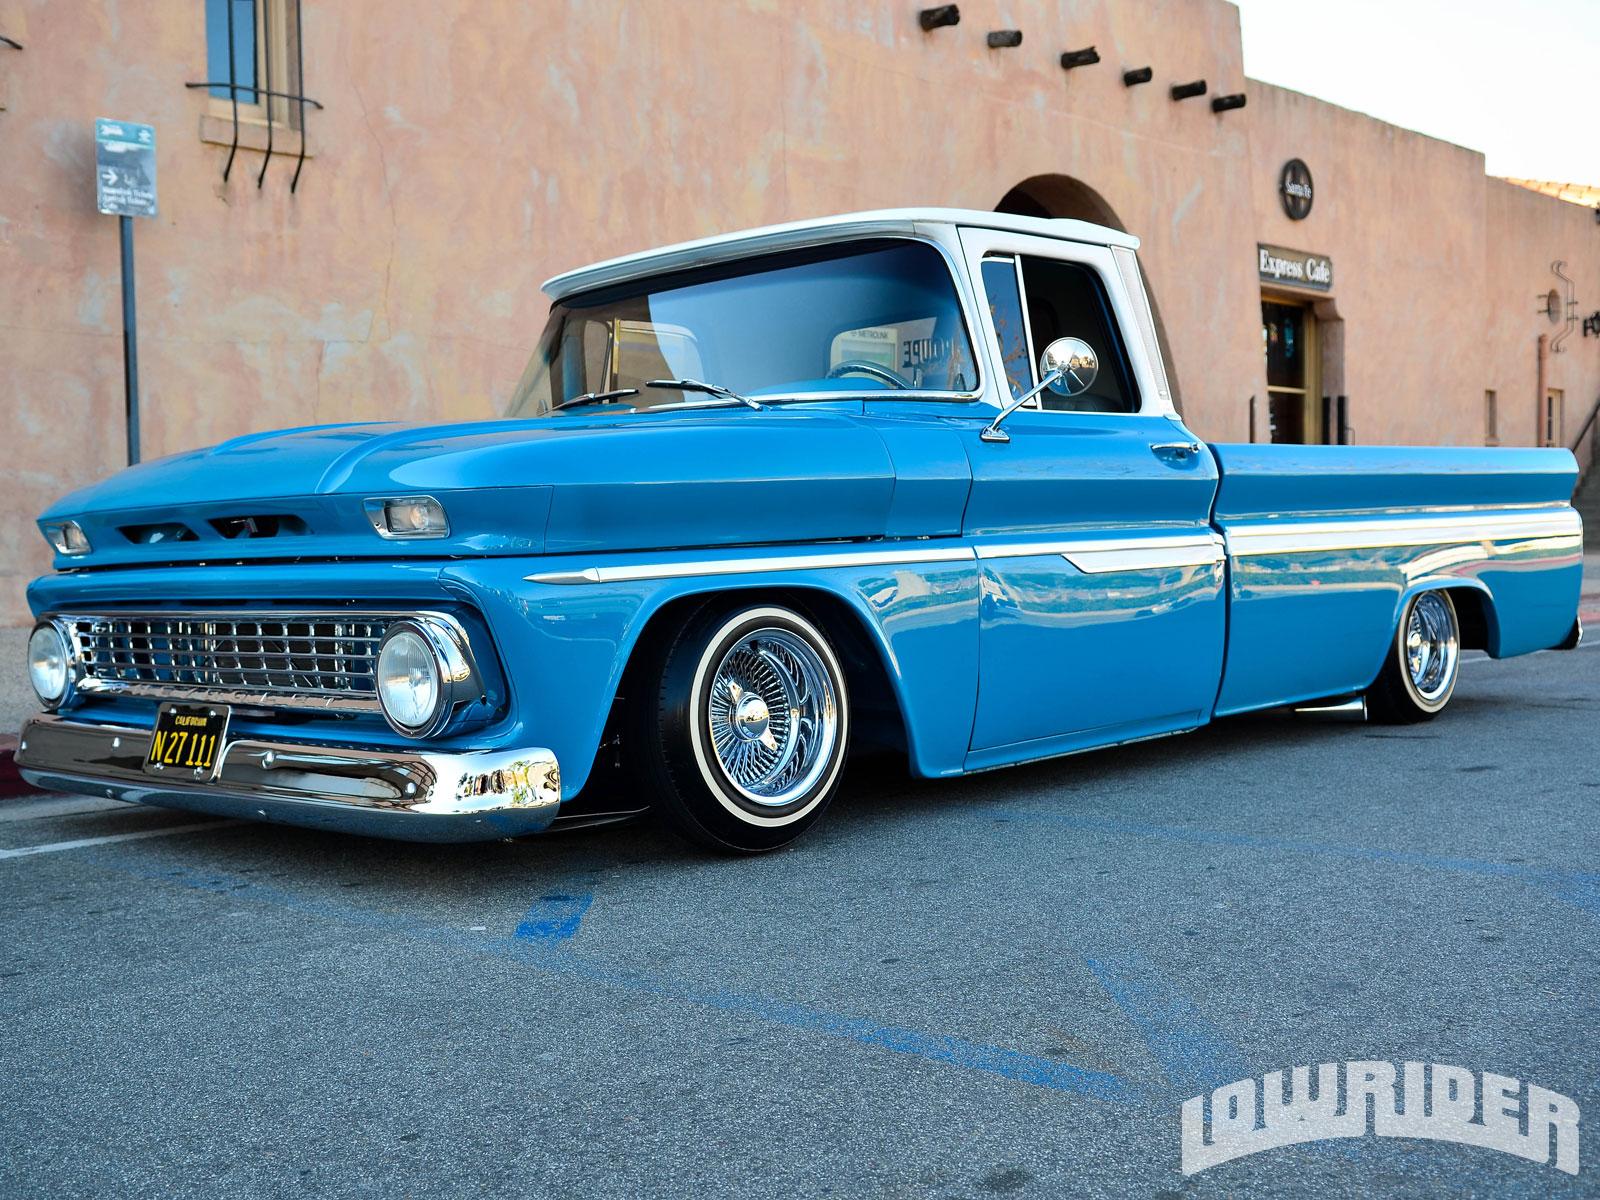 63 Chevy Truck >> 1963 Chevrolet Truck - Lowrider Magazine